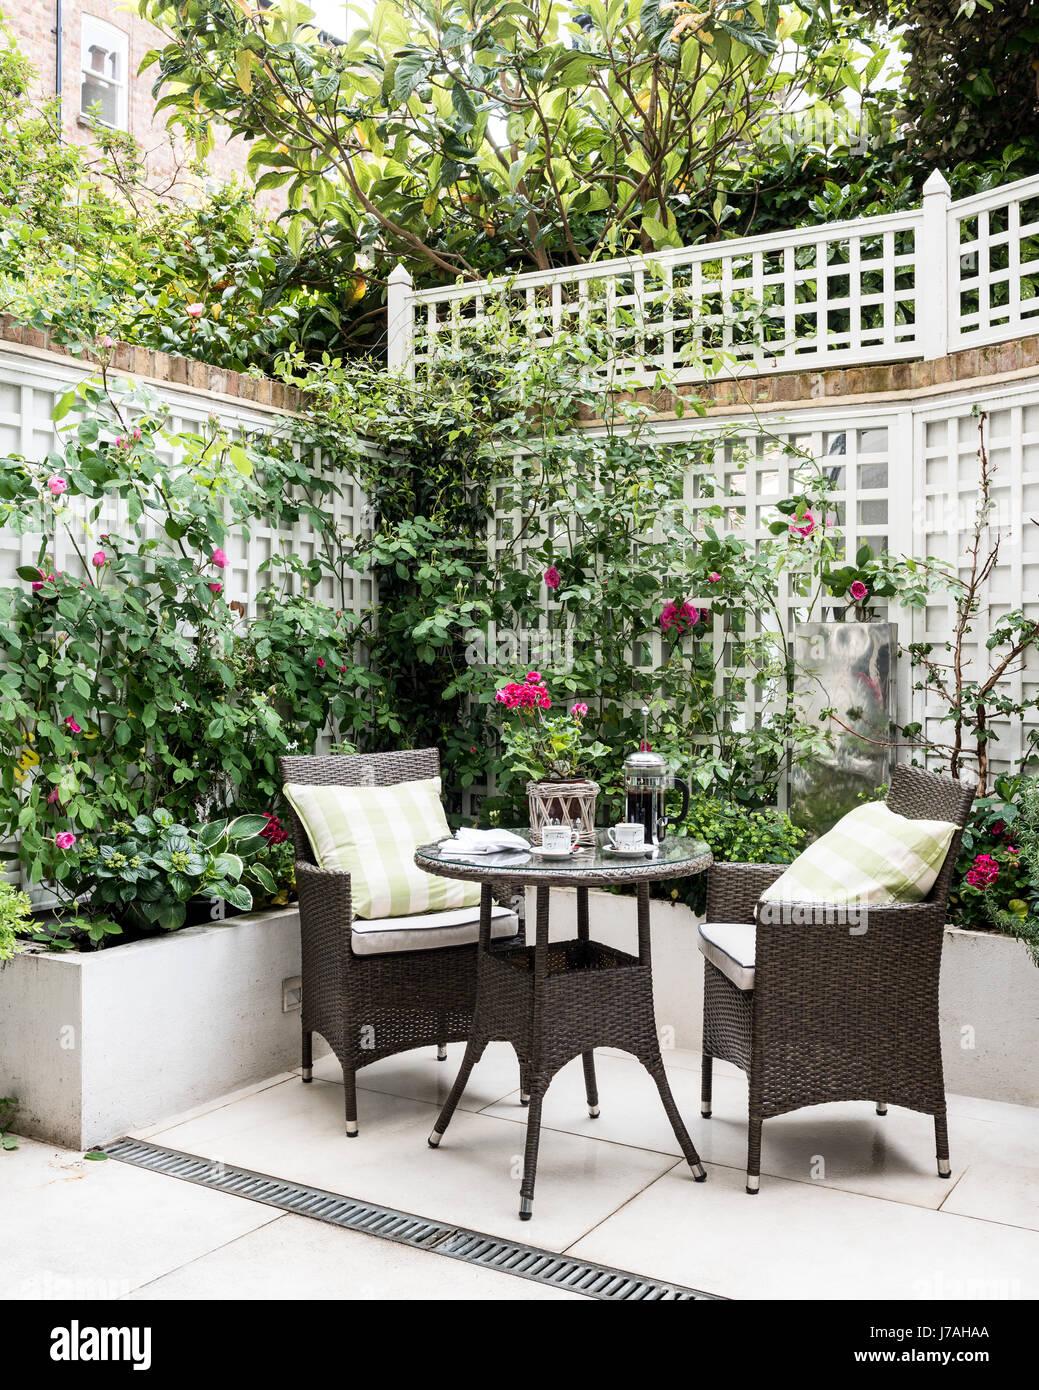 Wicker furniture in courtyard garden of Victorian terrace, London - Stock Image